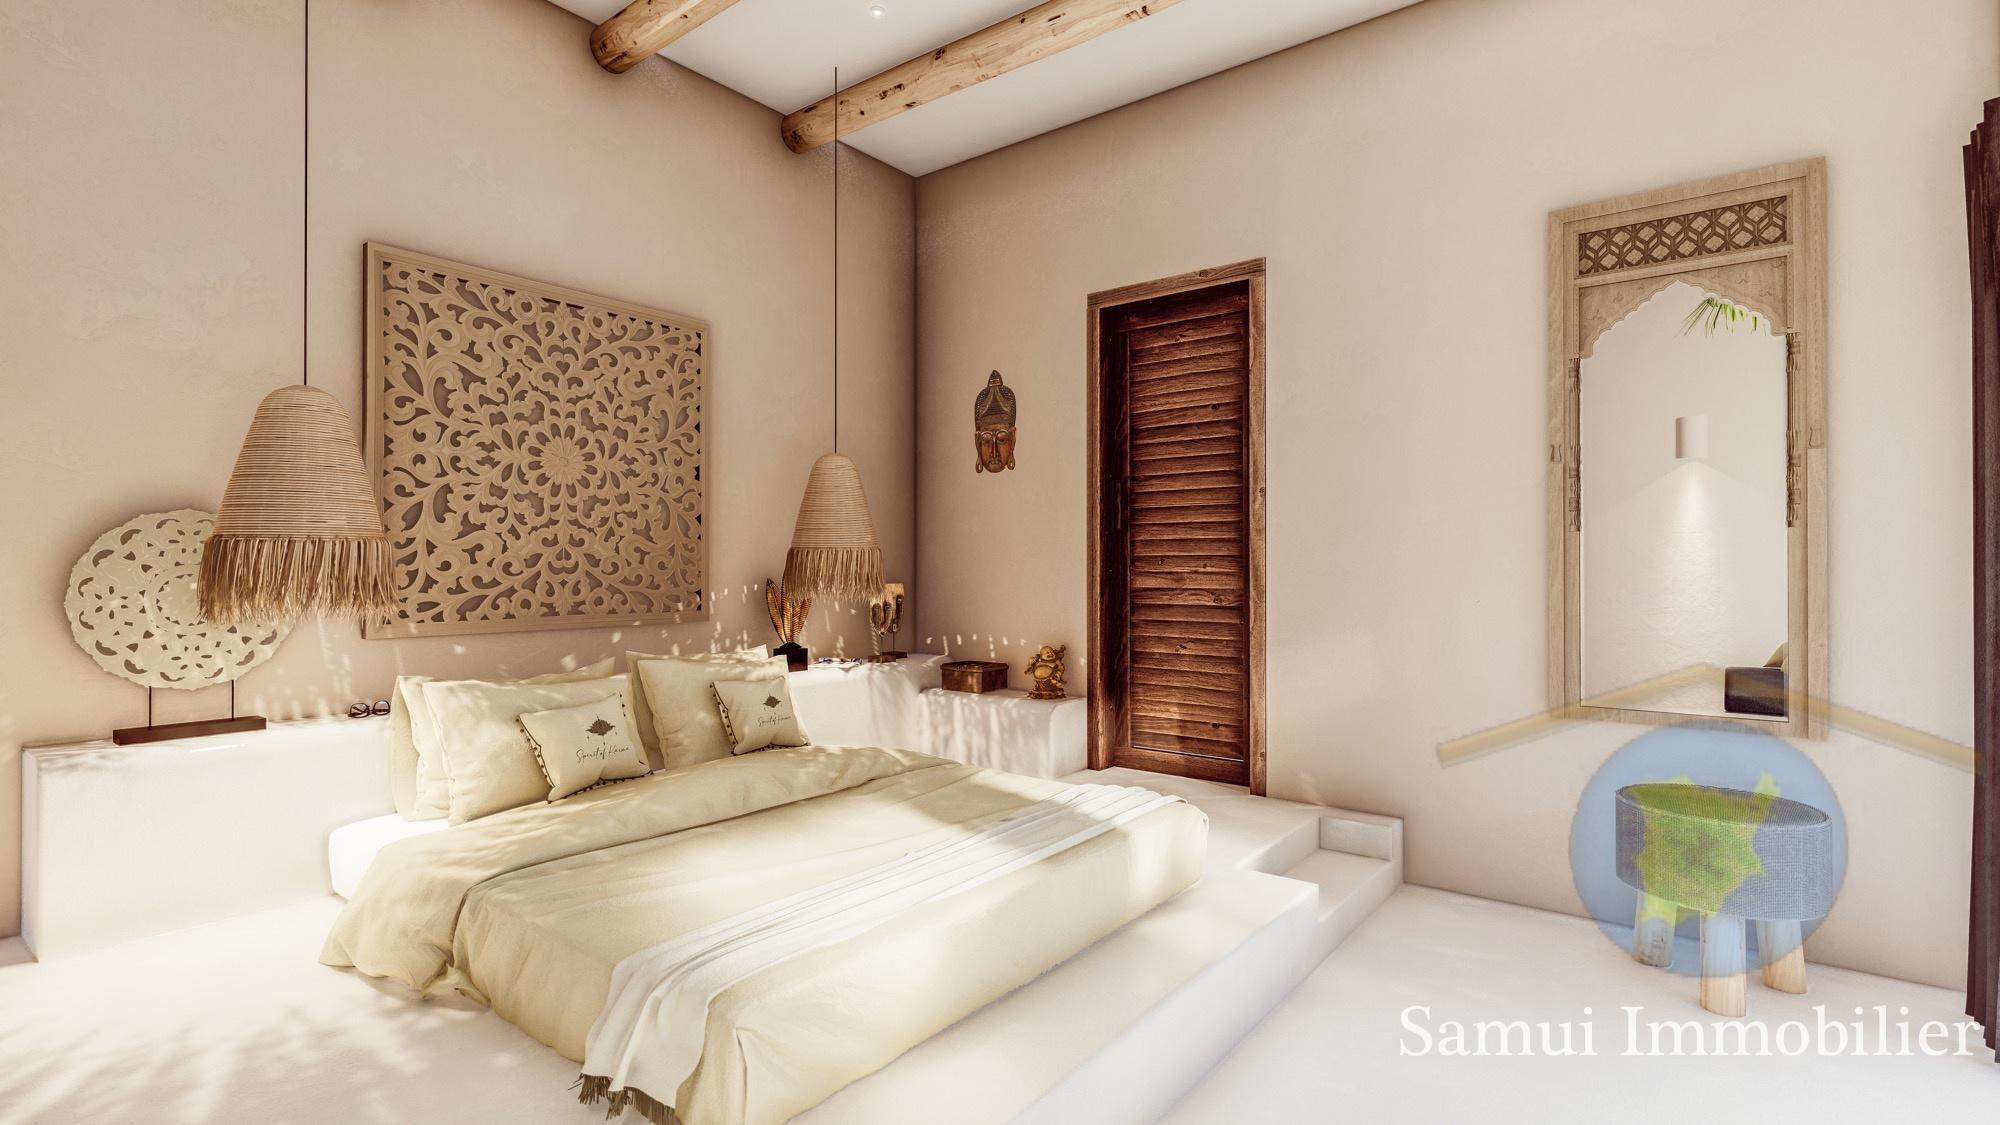 Villas for sale in lease - 2 or 3 bedrooms - Bophut